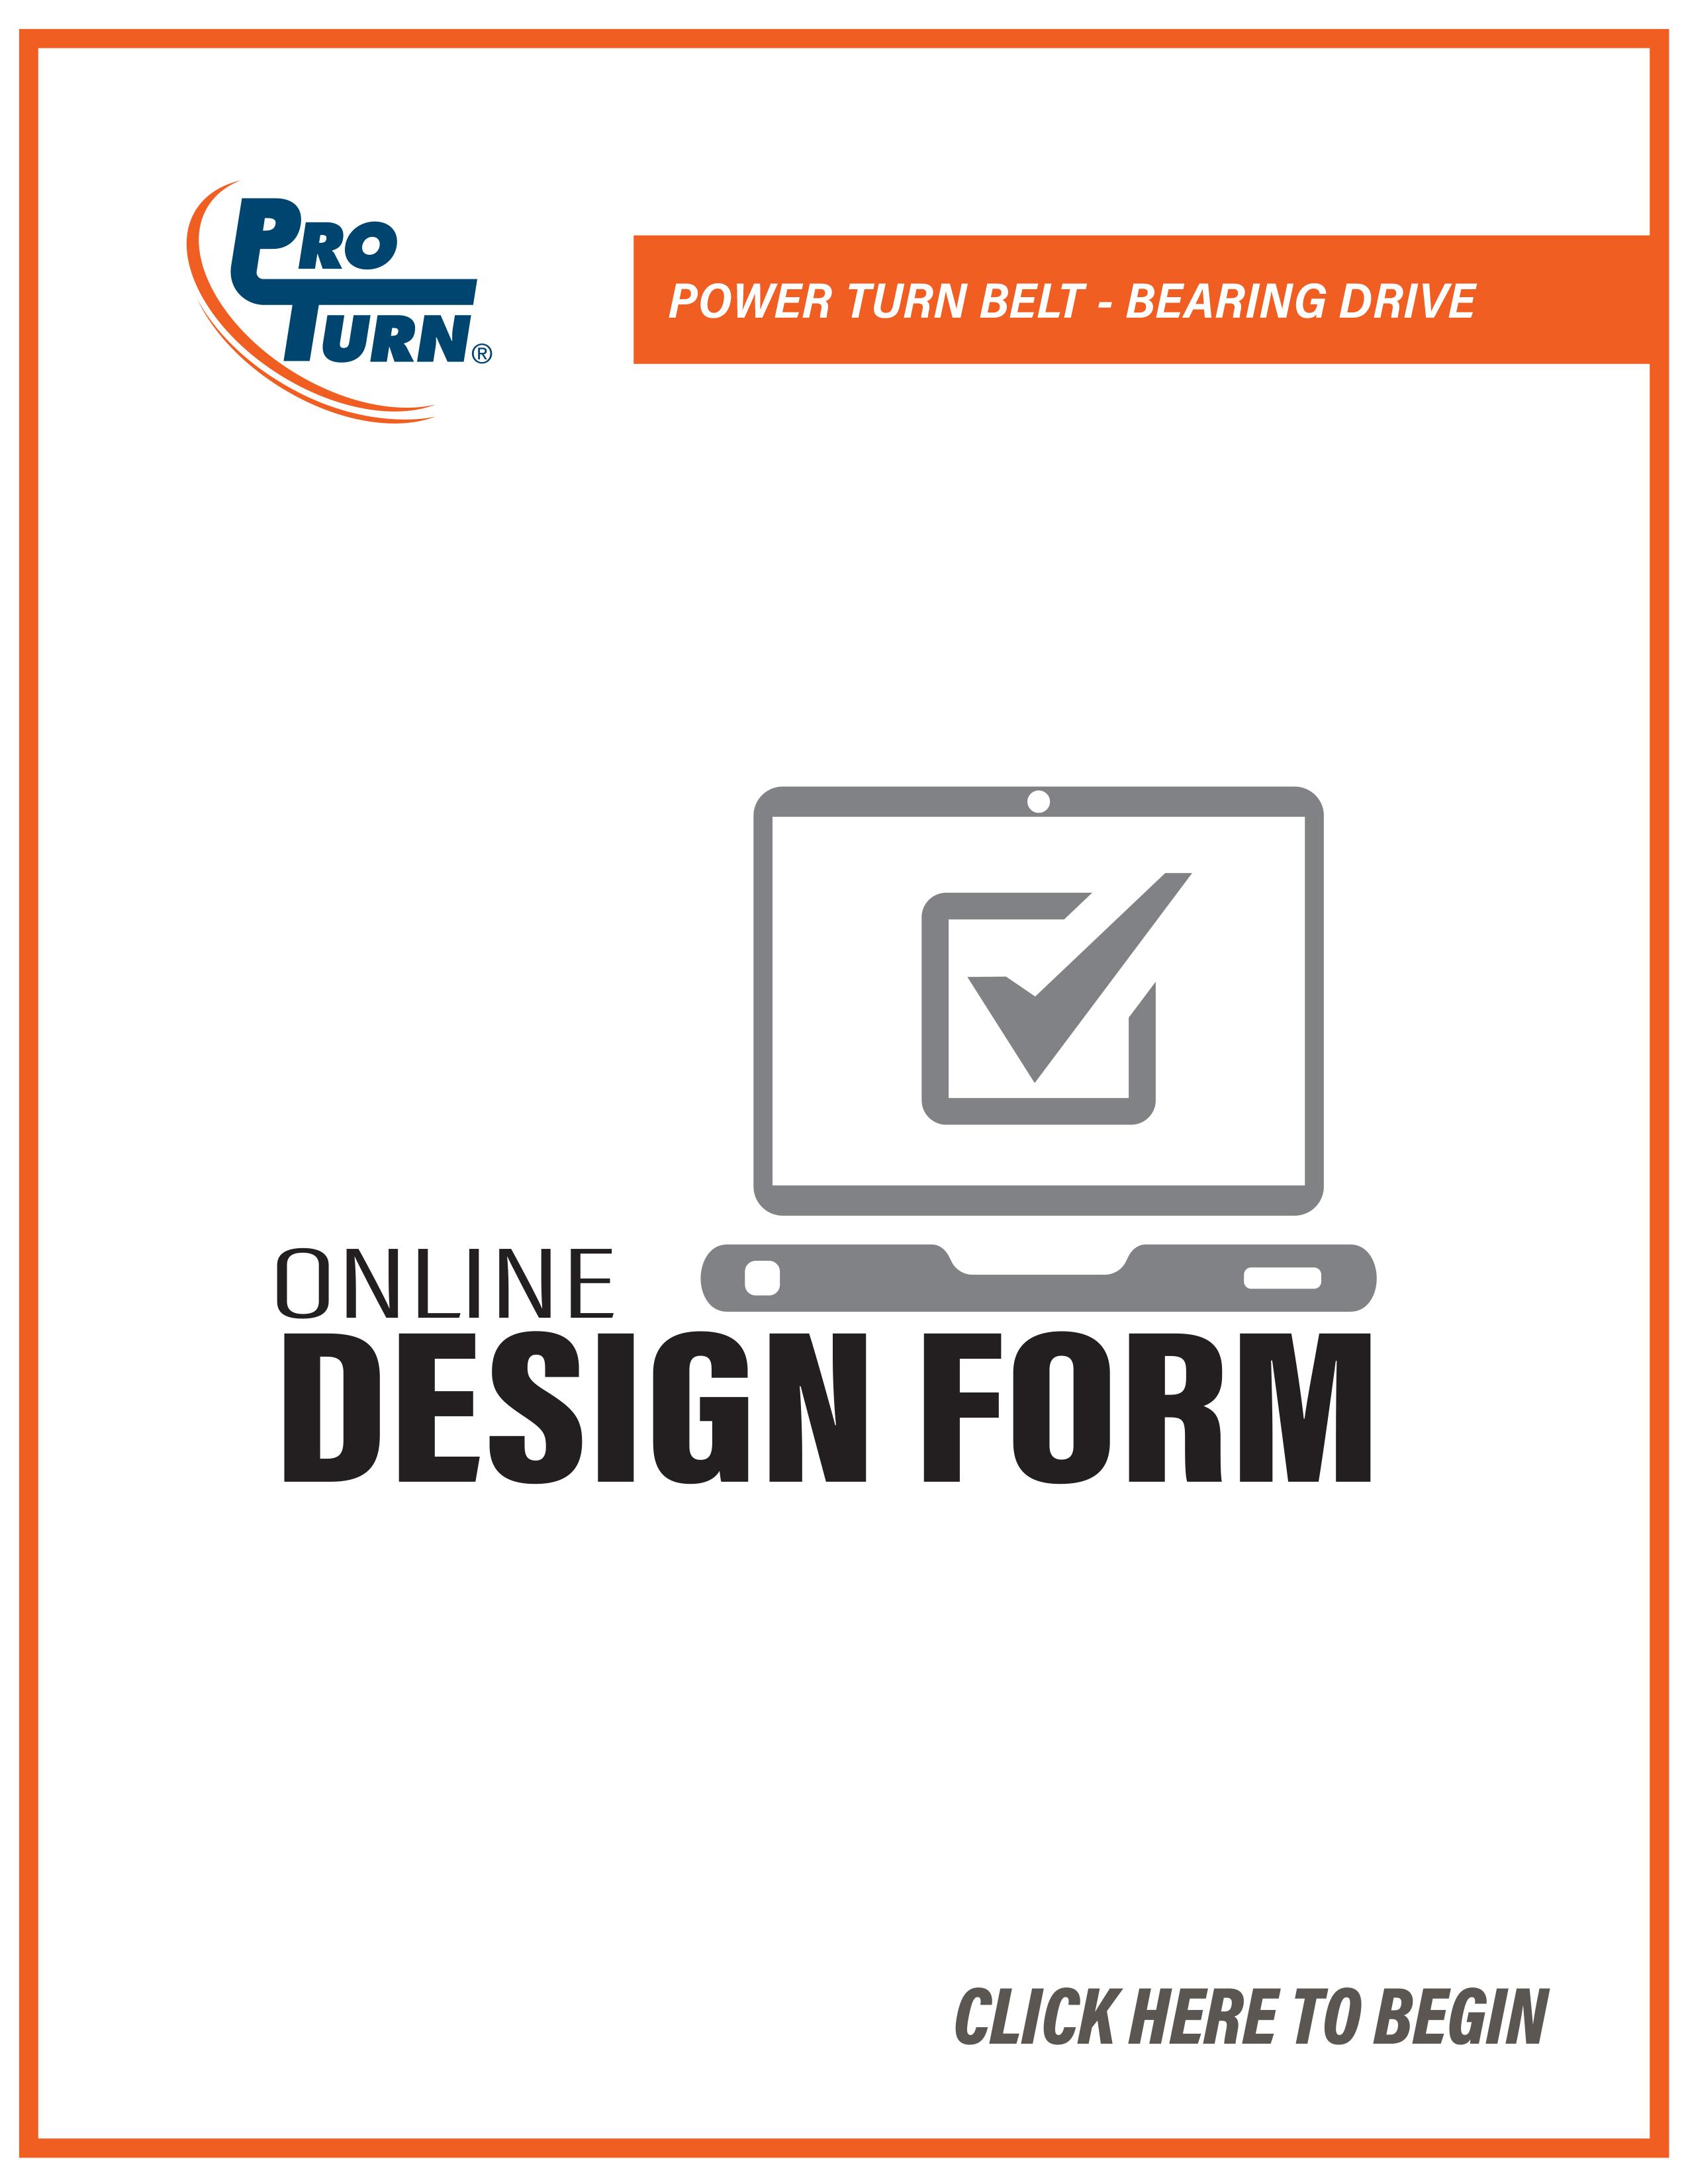 ProTurn - Power Turn Belt - Bearing Drive